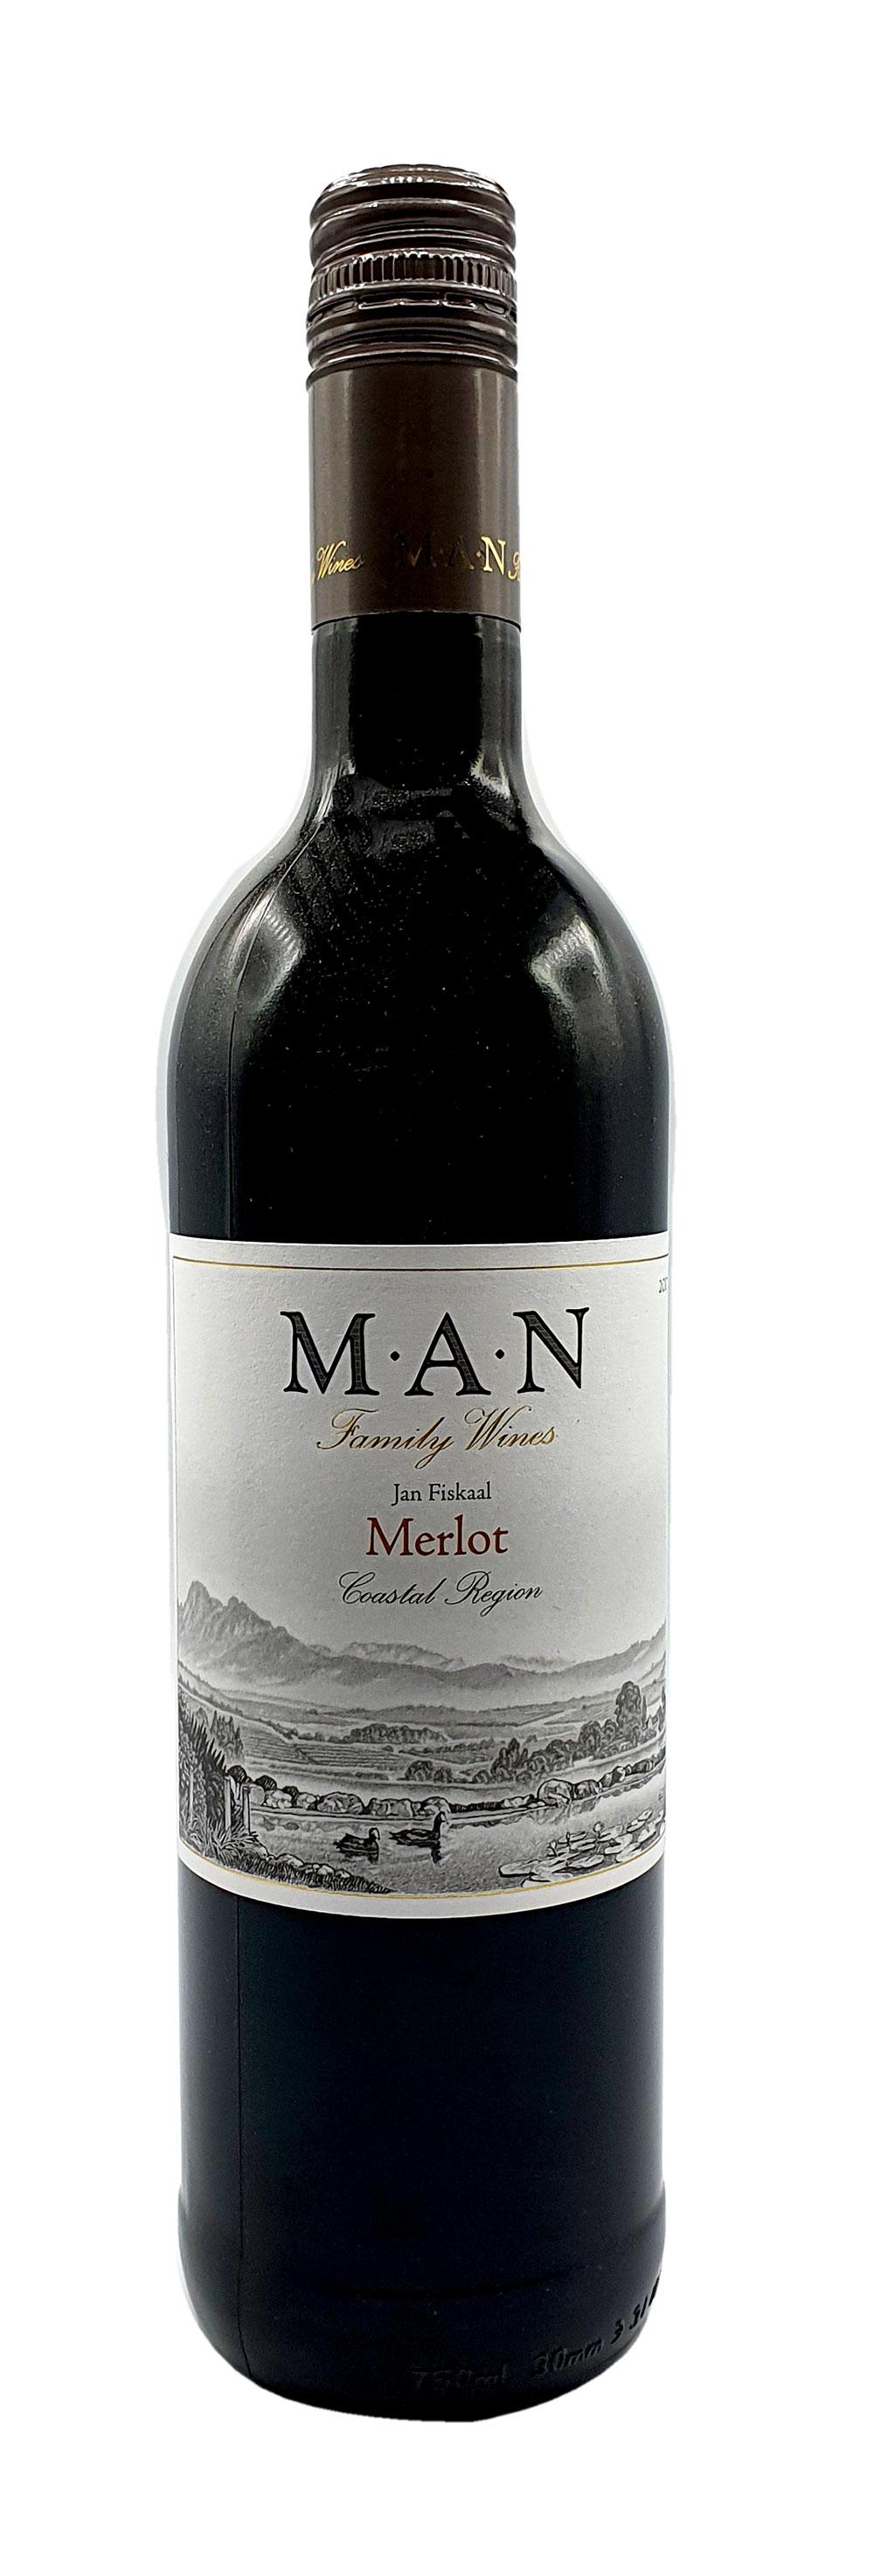 MAN Rotwein 0,75L (14% Vol) - Jan Fiskaal Merlot - Südafrika- [Enthält Sulfite]